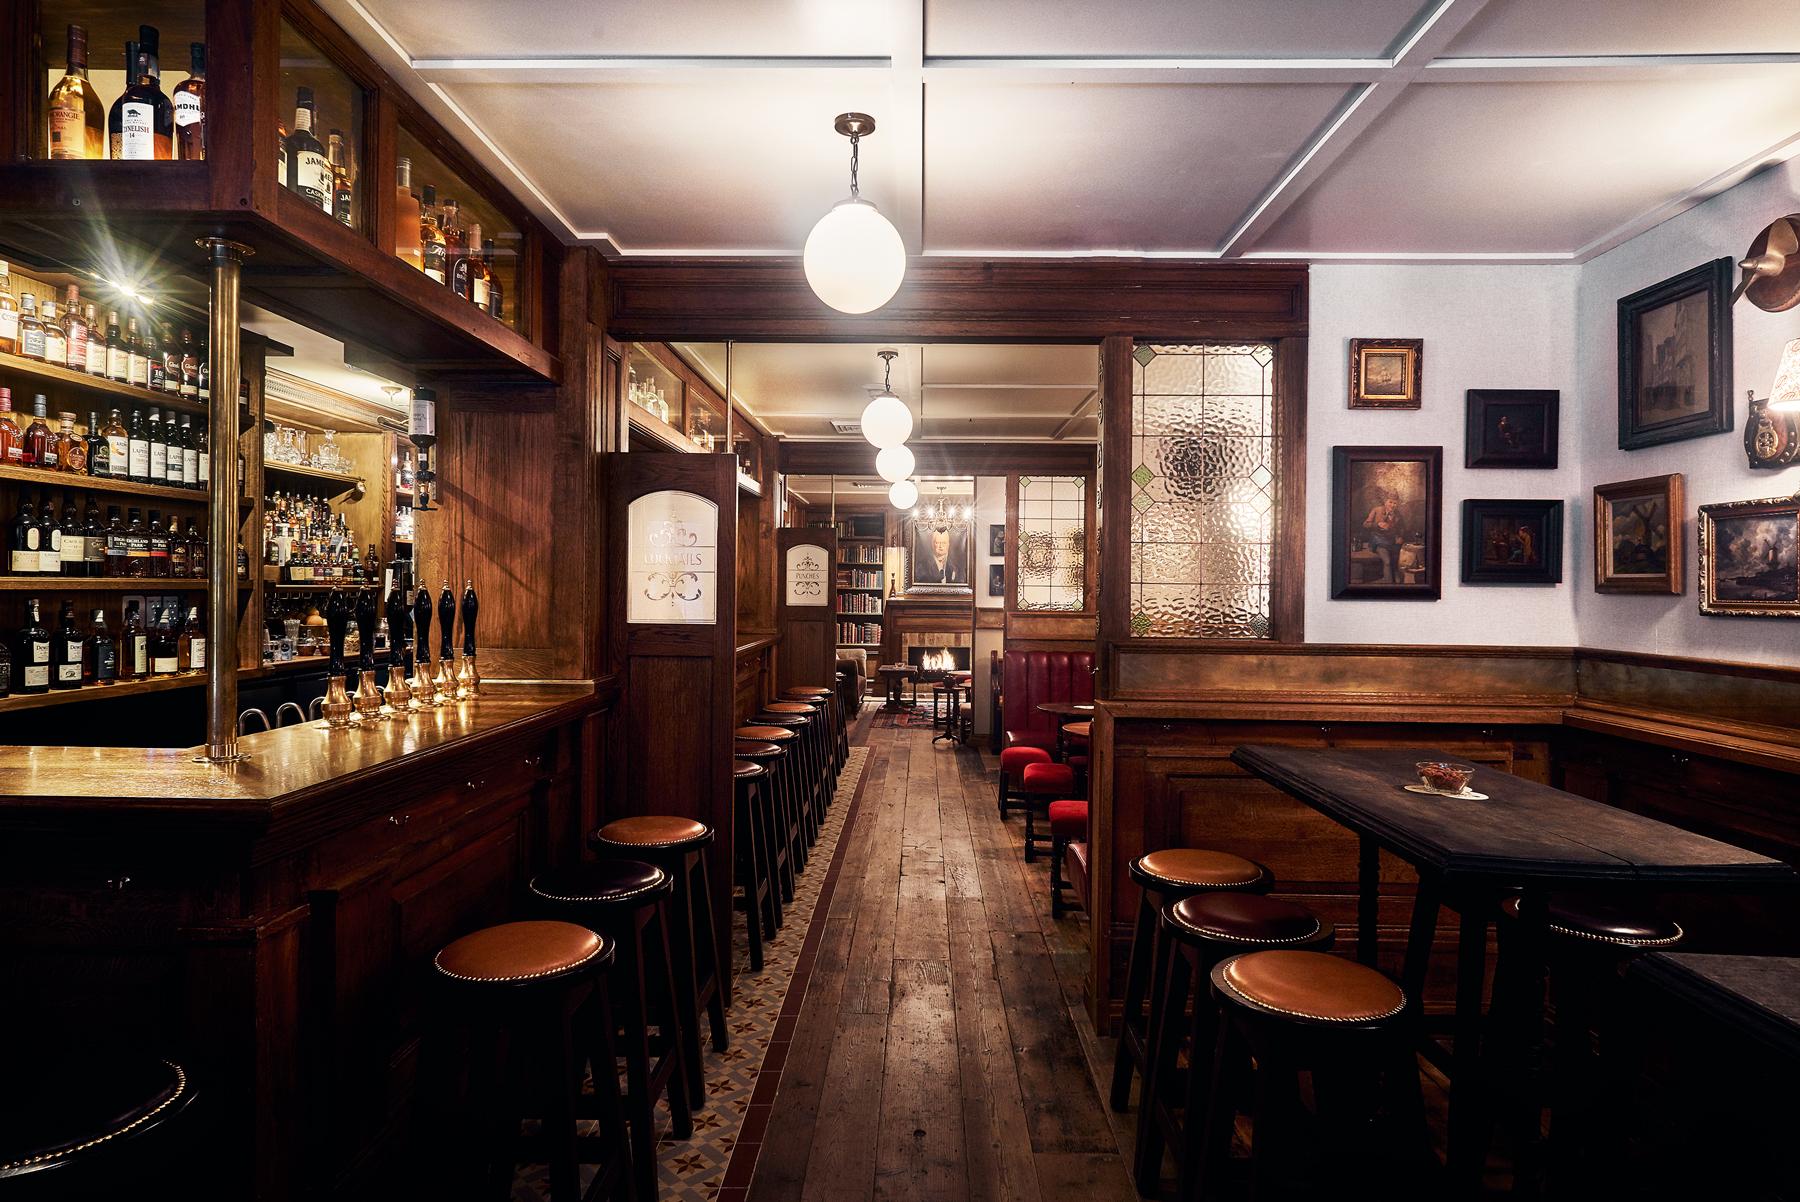 sydney u0026 39 s new british pub interior created by film set